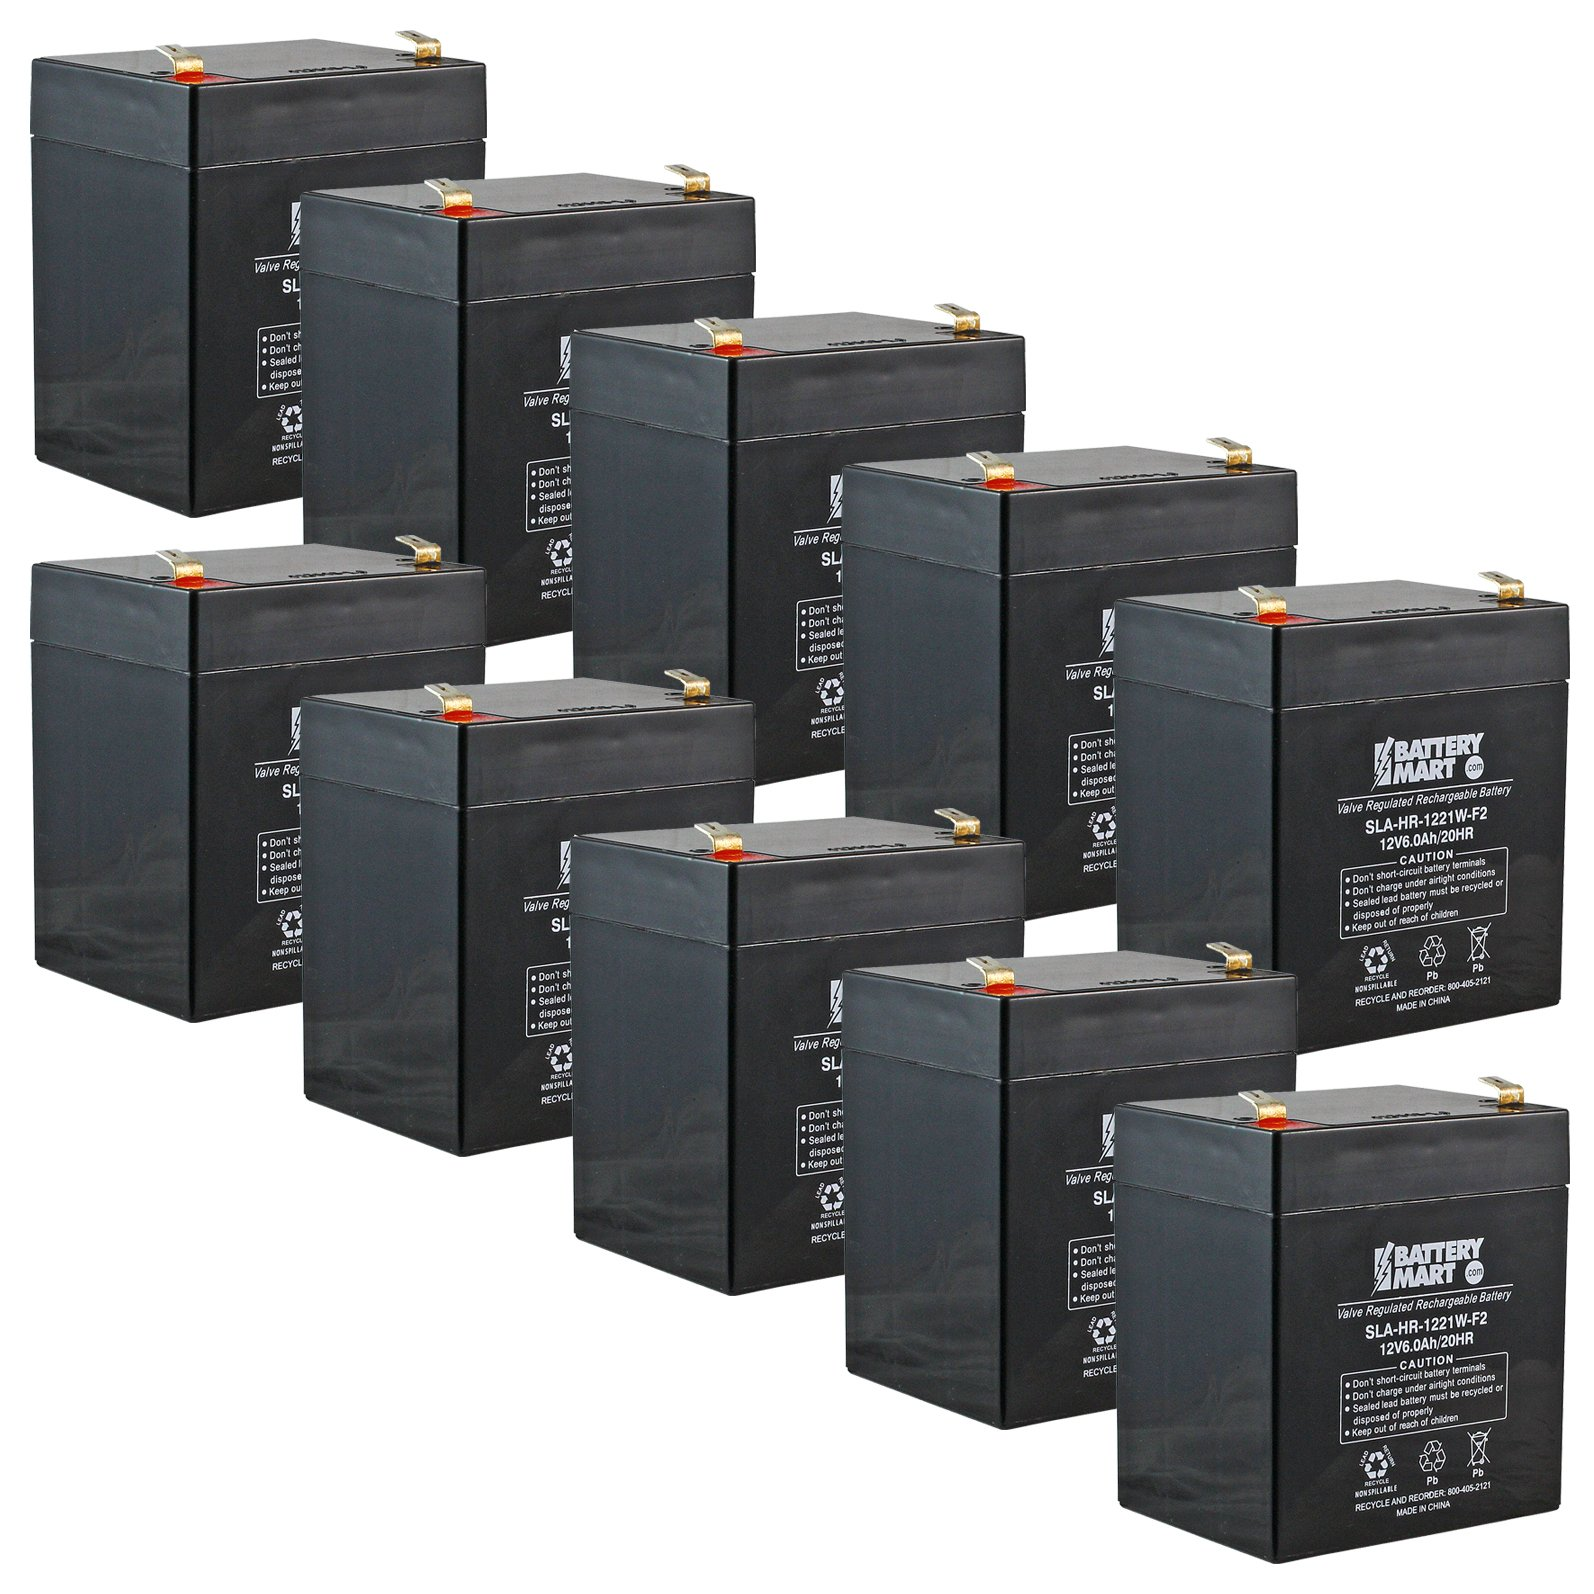 [10 Pack] 12 Volt 5 Ah Sealed Lead Acid Rechargeable Batteries - F2 Terminal